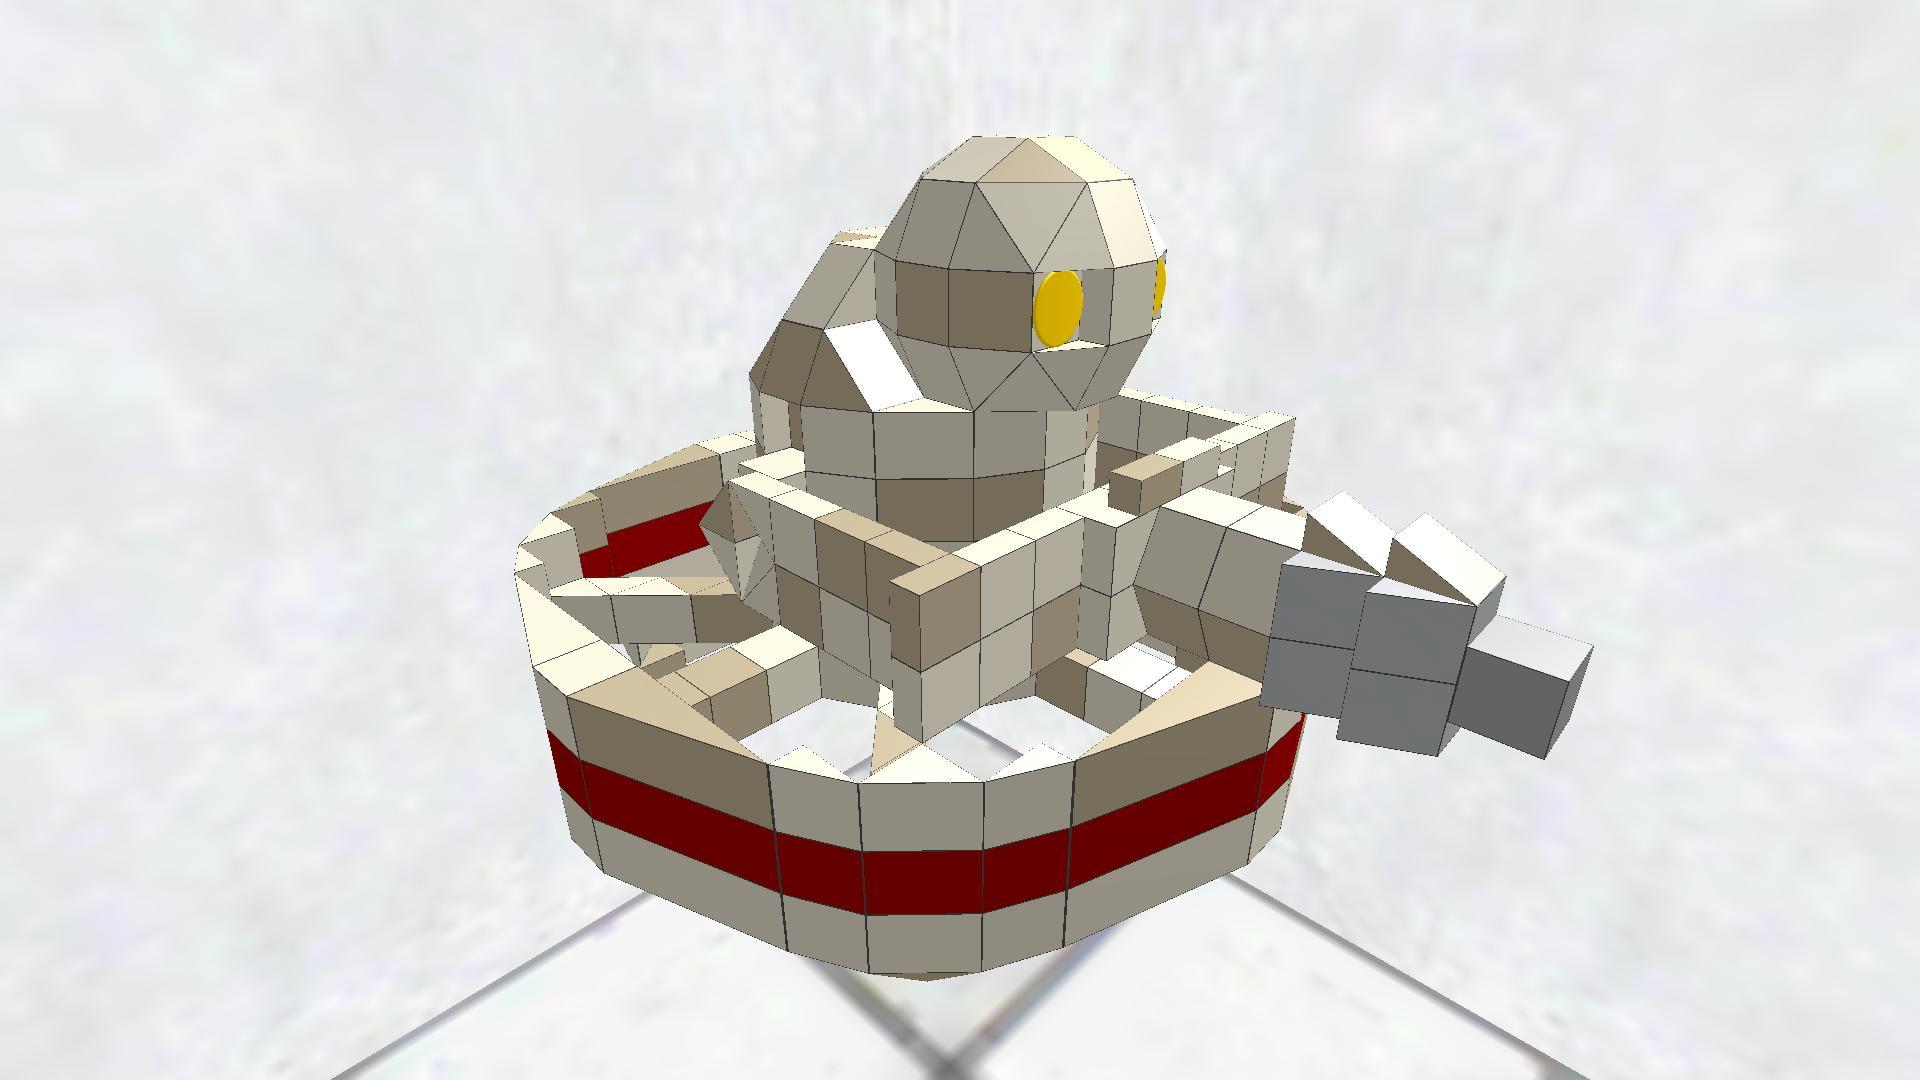 NieR:Automata 小型飛行体